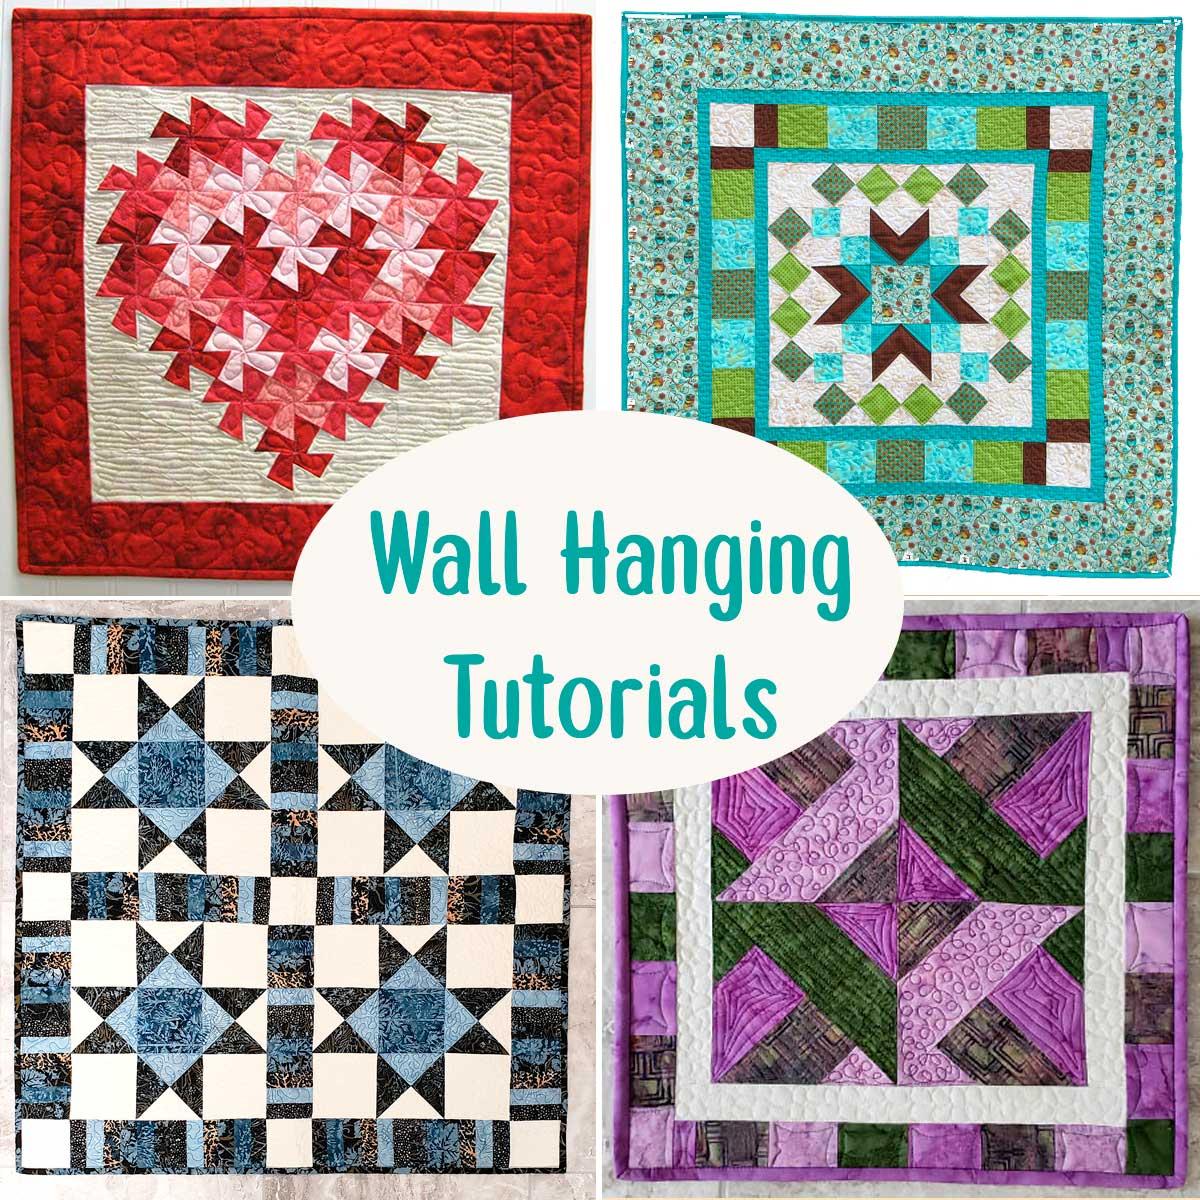 Wall Hanging tutorials